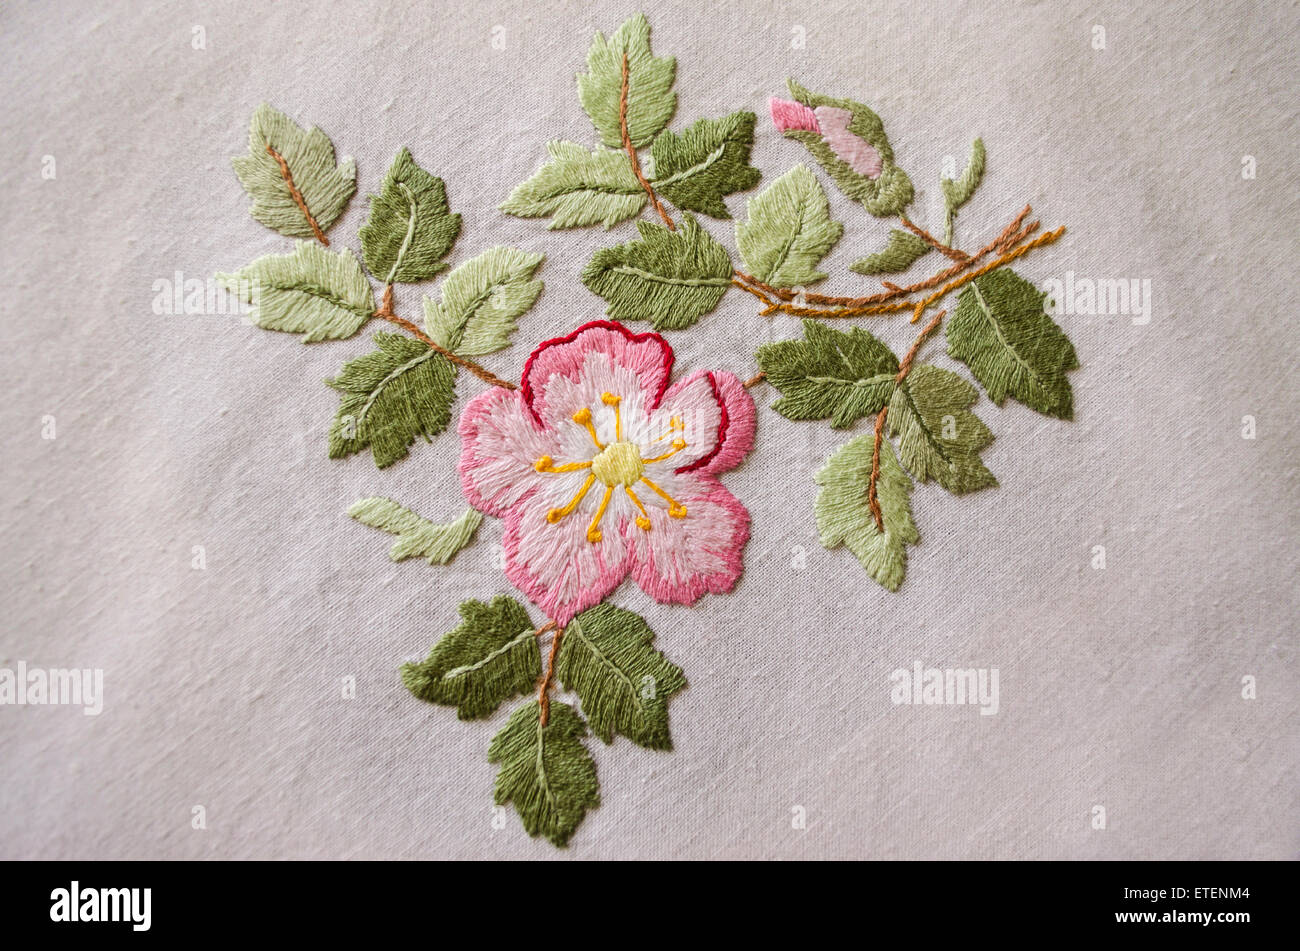 Embroidered satin stitch pink floweron cotton cloth - Stock Image